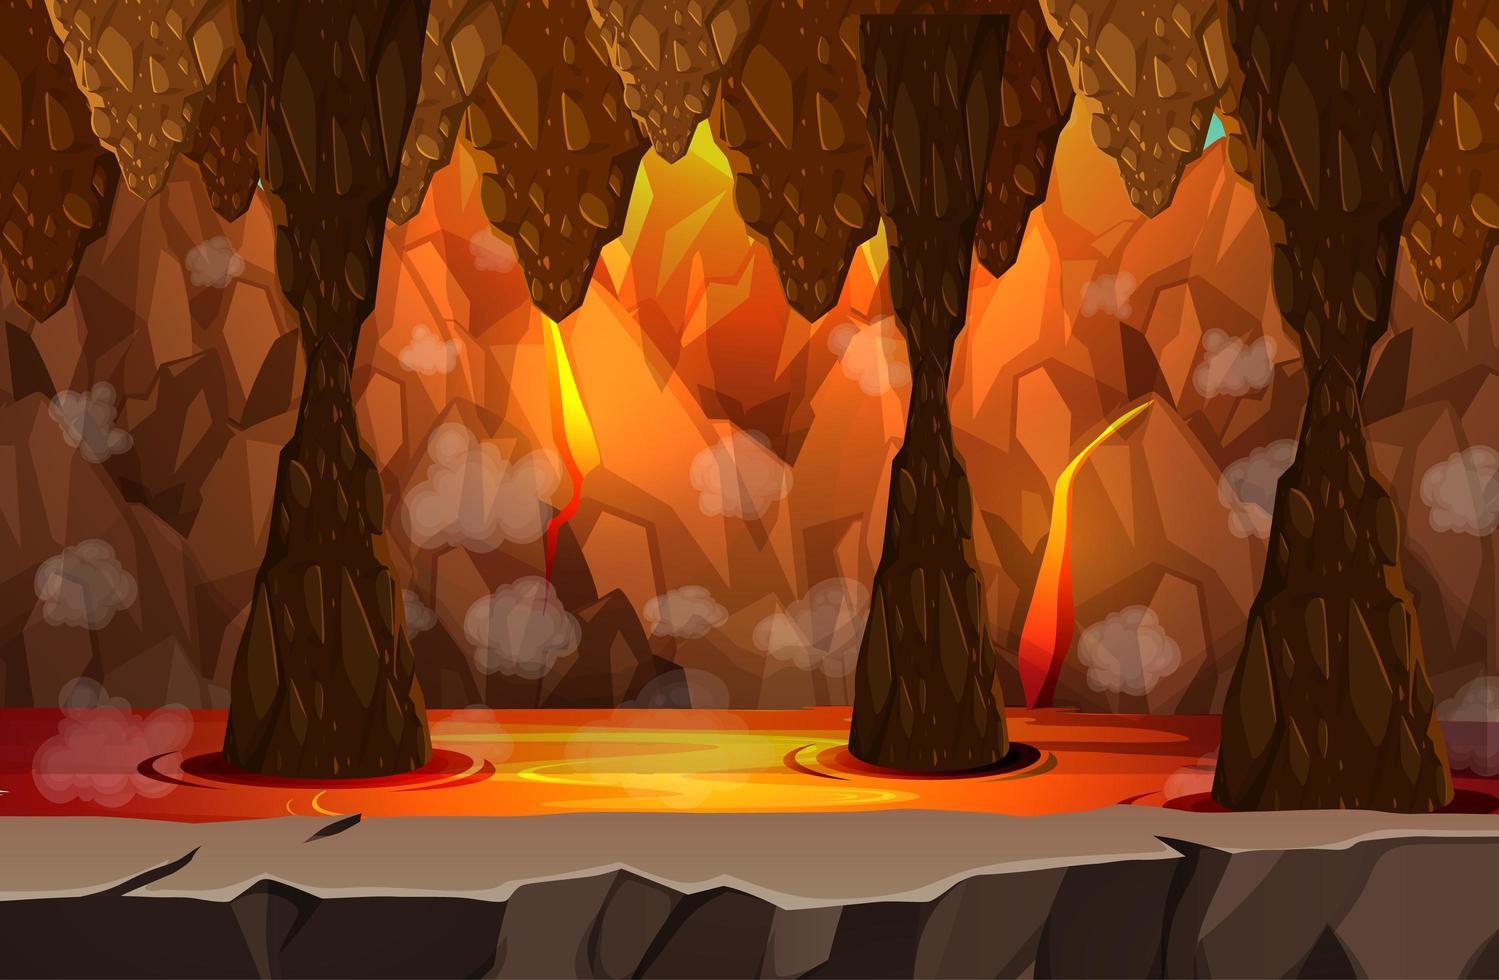 höllische dunkle Höhle mit Lavaszene vektor